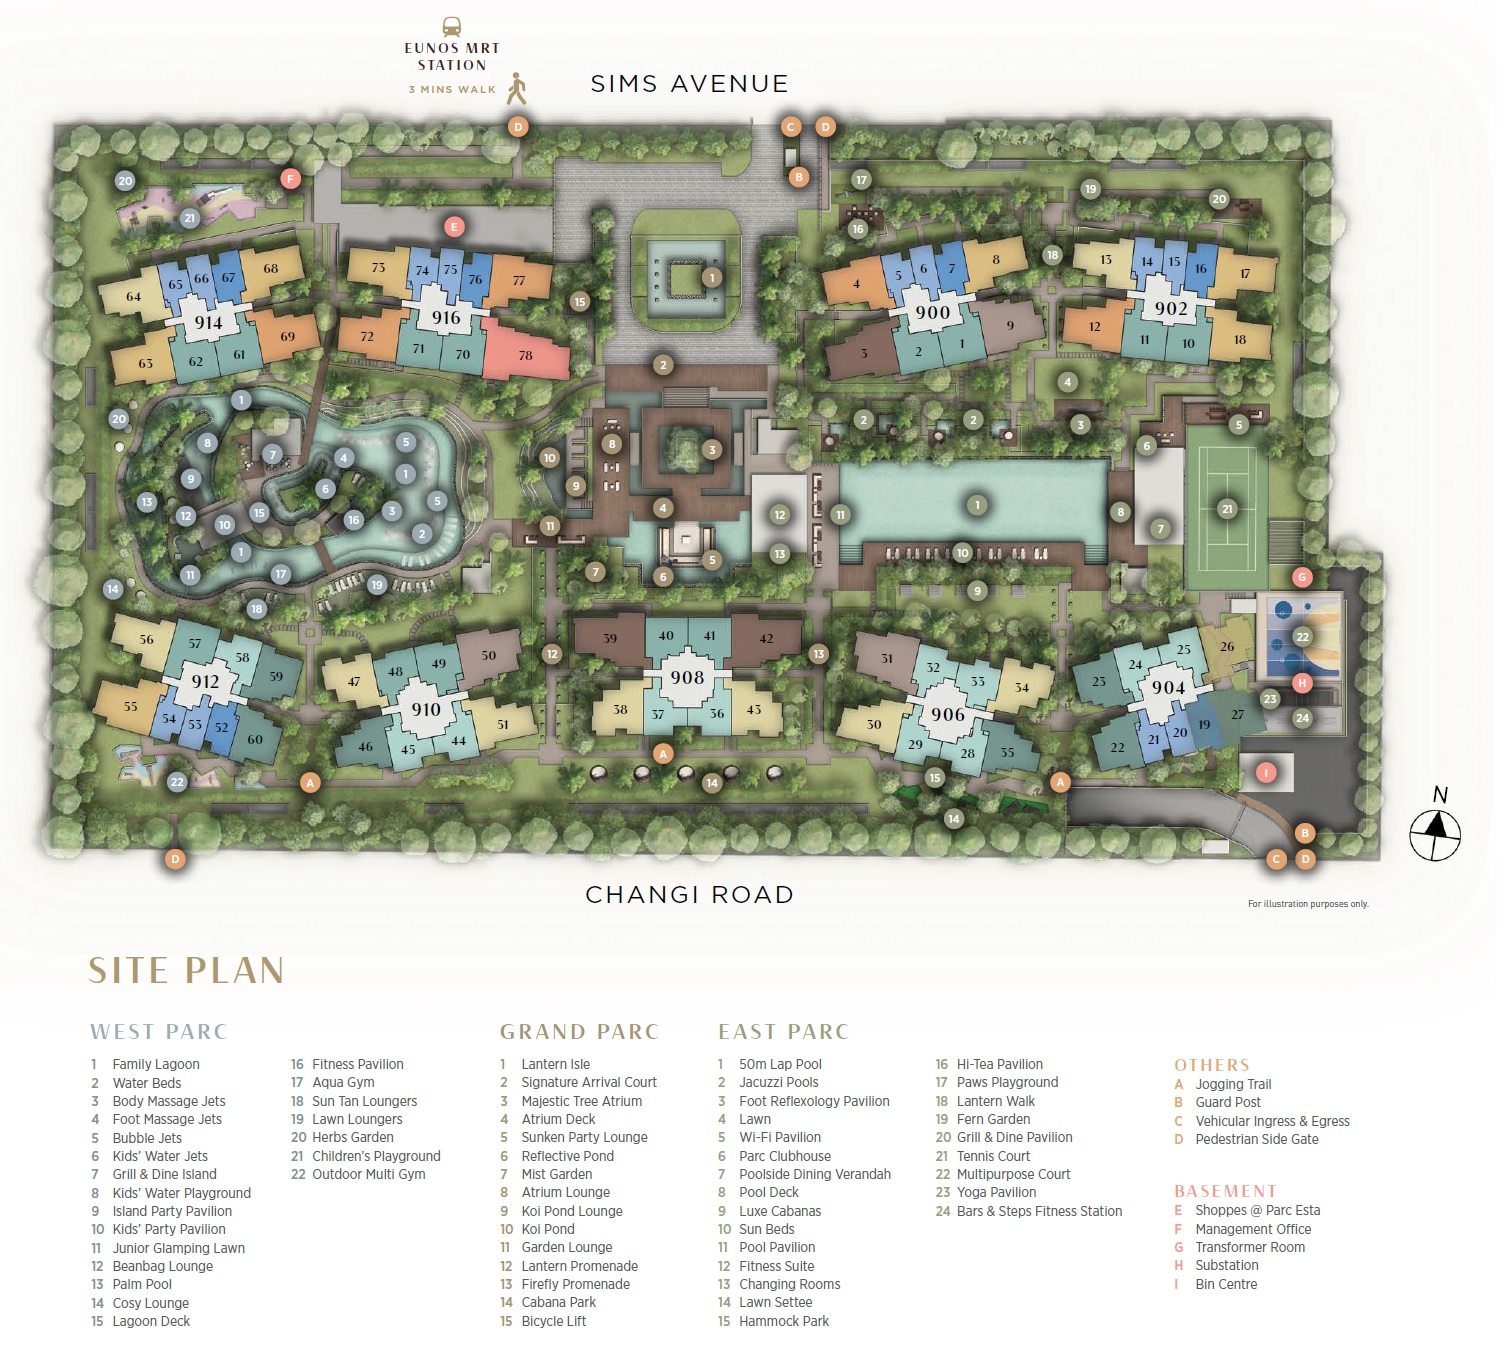 Parc Esta, 东景苑 site plan